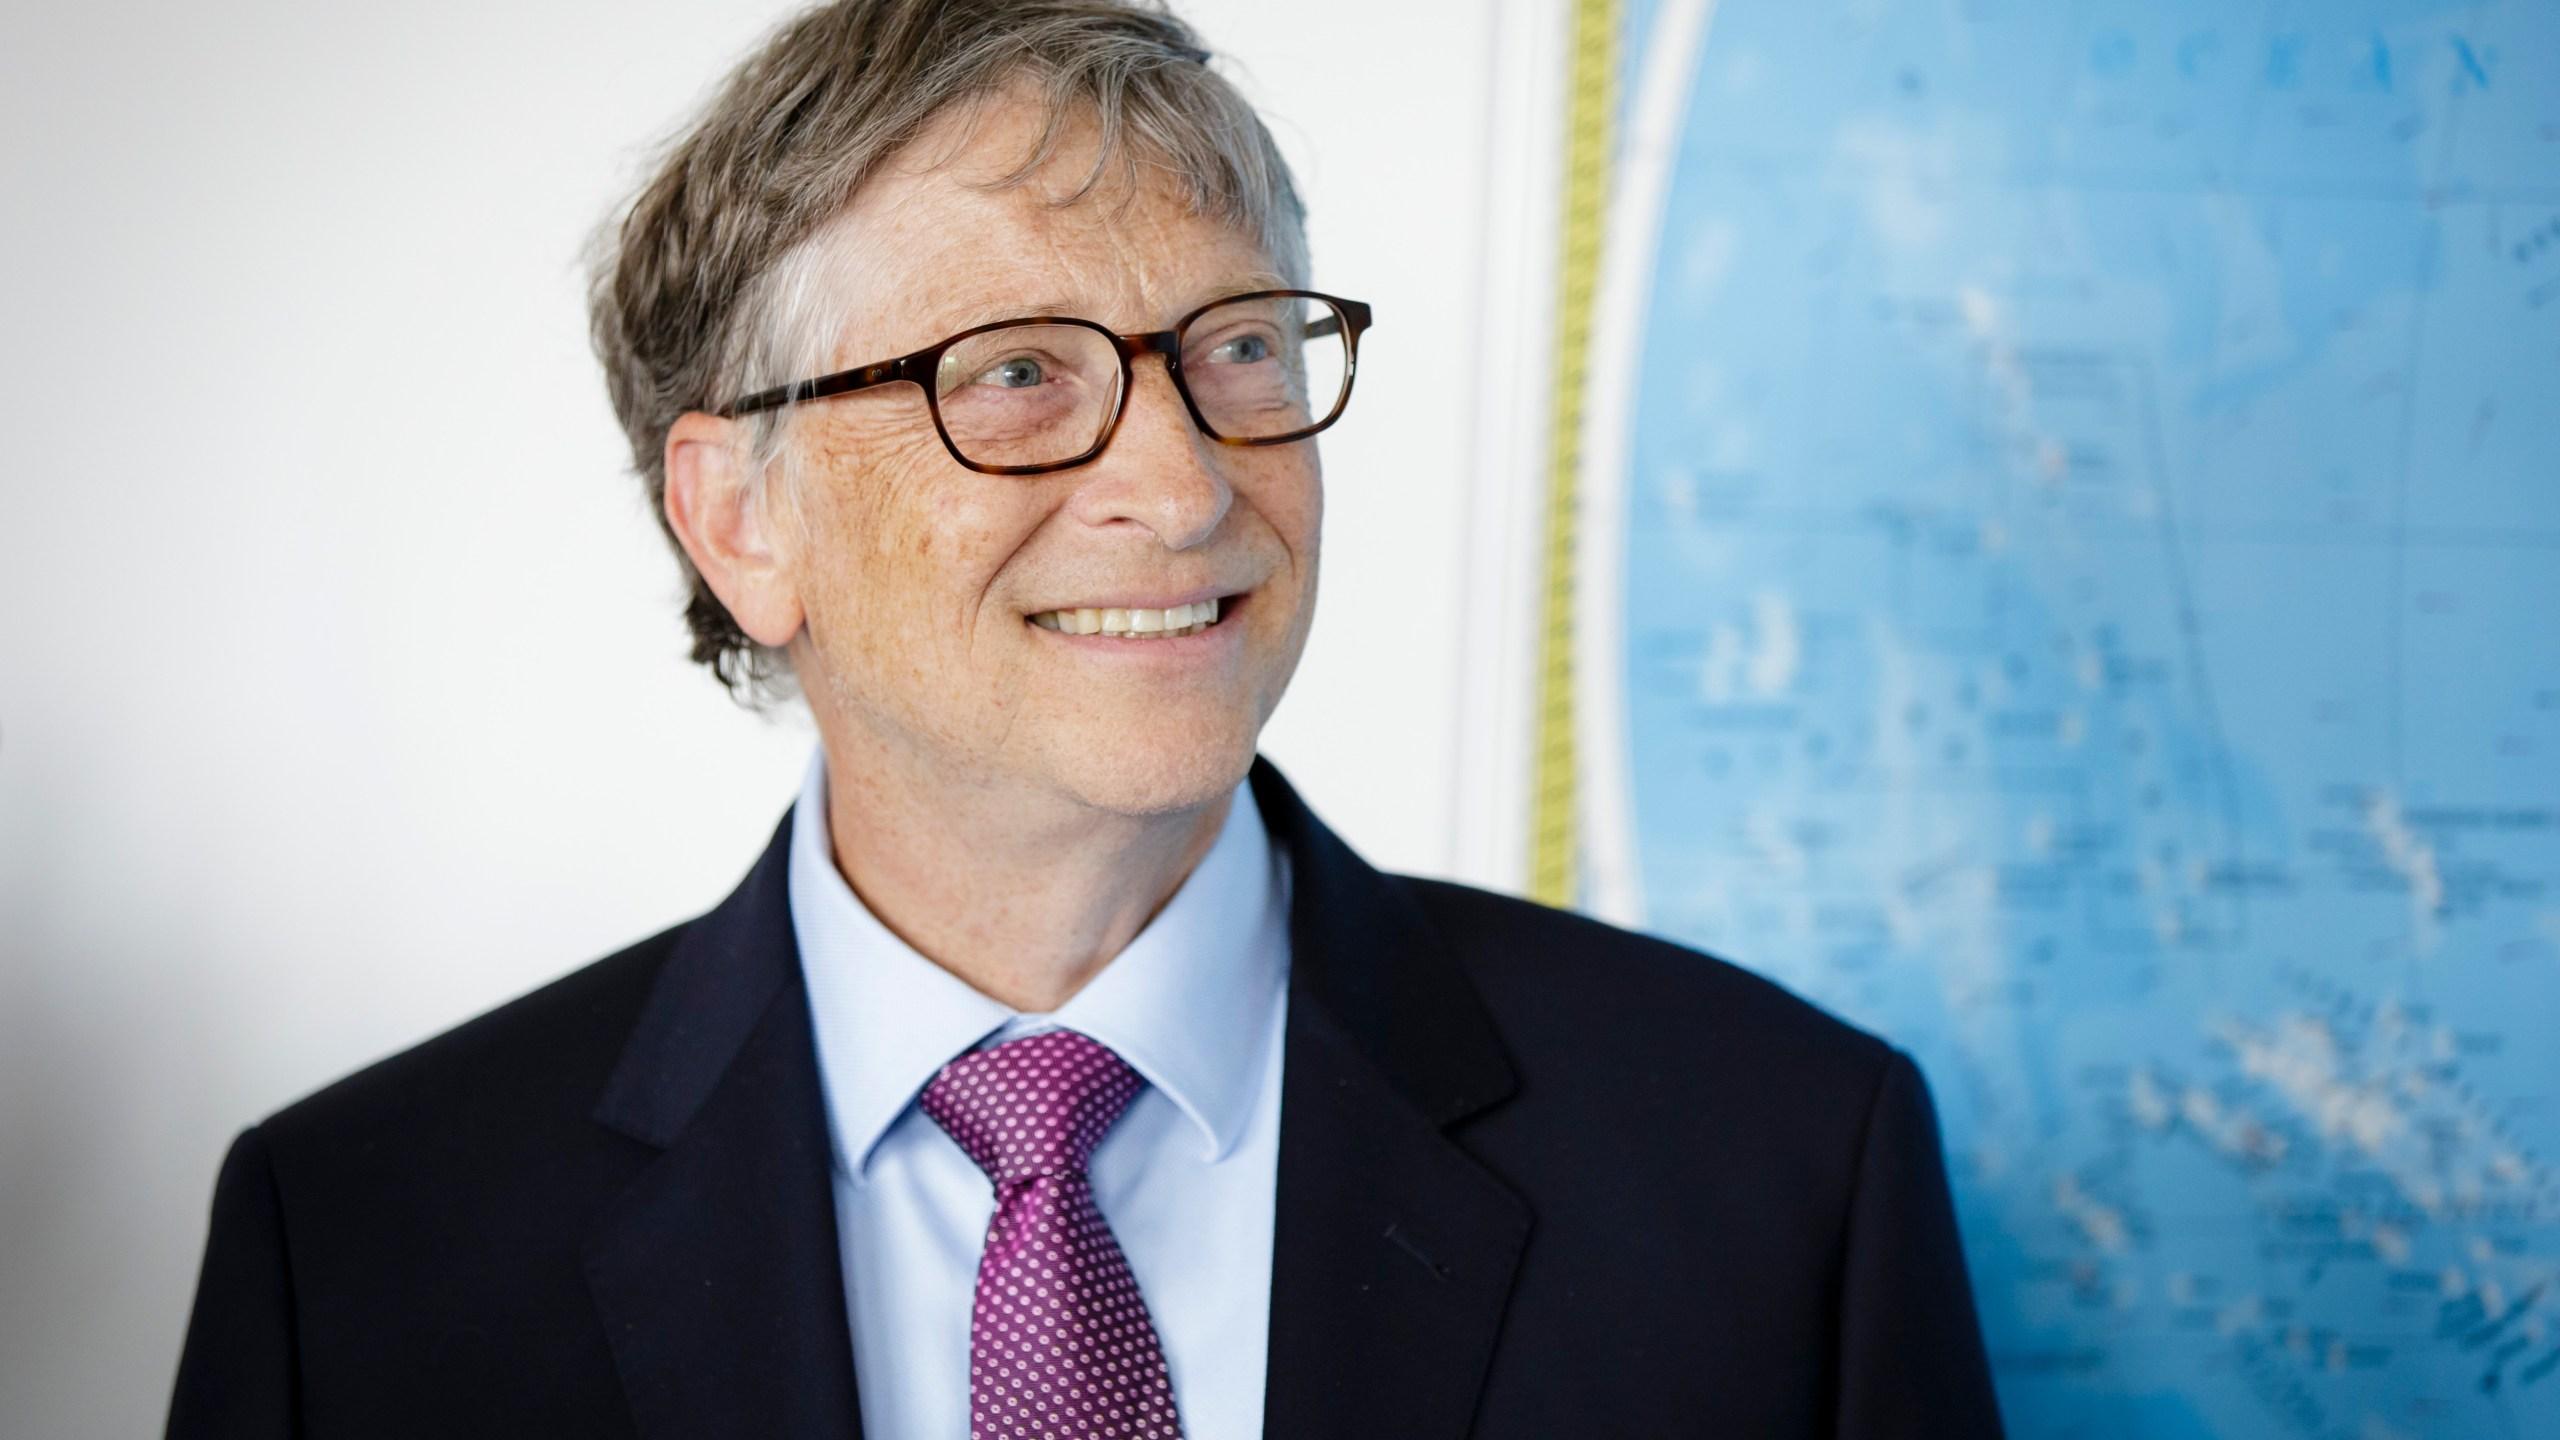 Bill Gates in Berlin, Germany in 2018 . (Photo by Inga Kjer/Photothek via Getty Images)